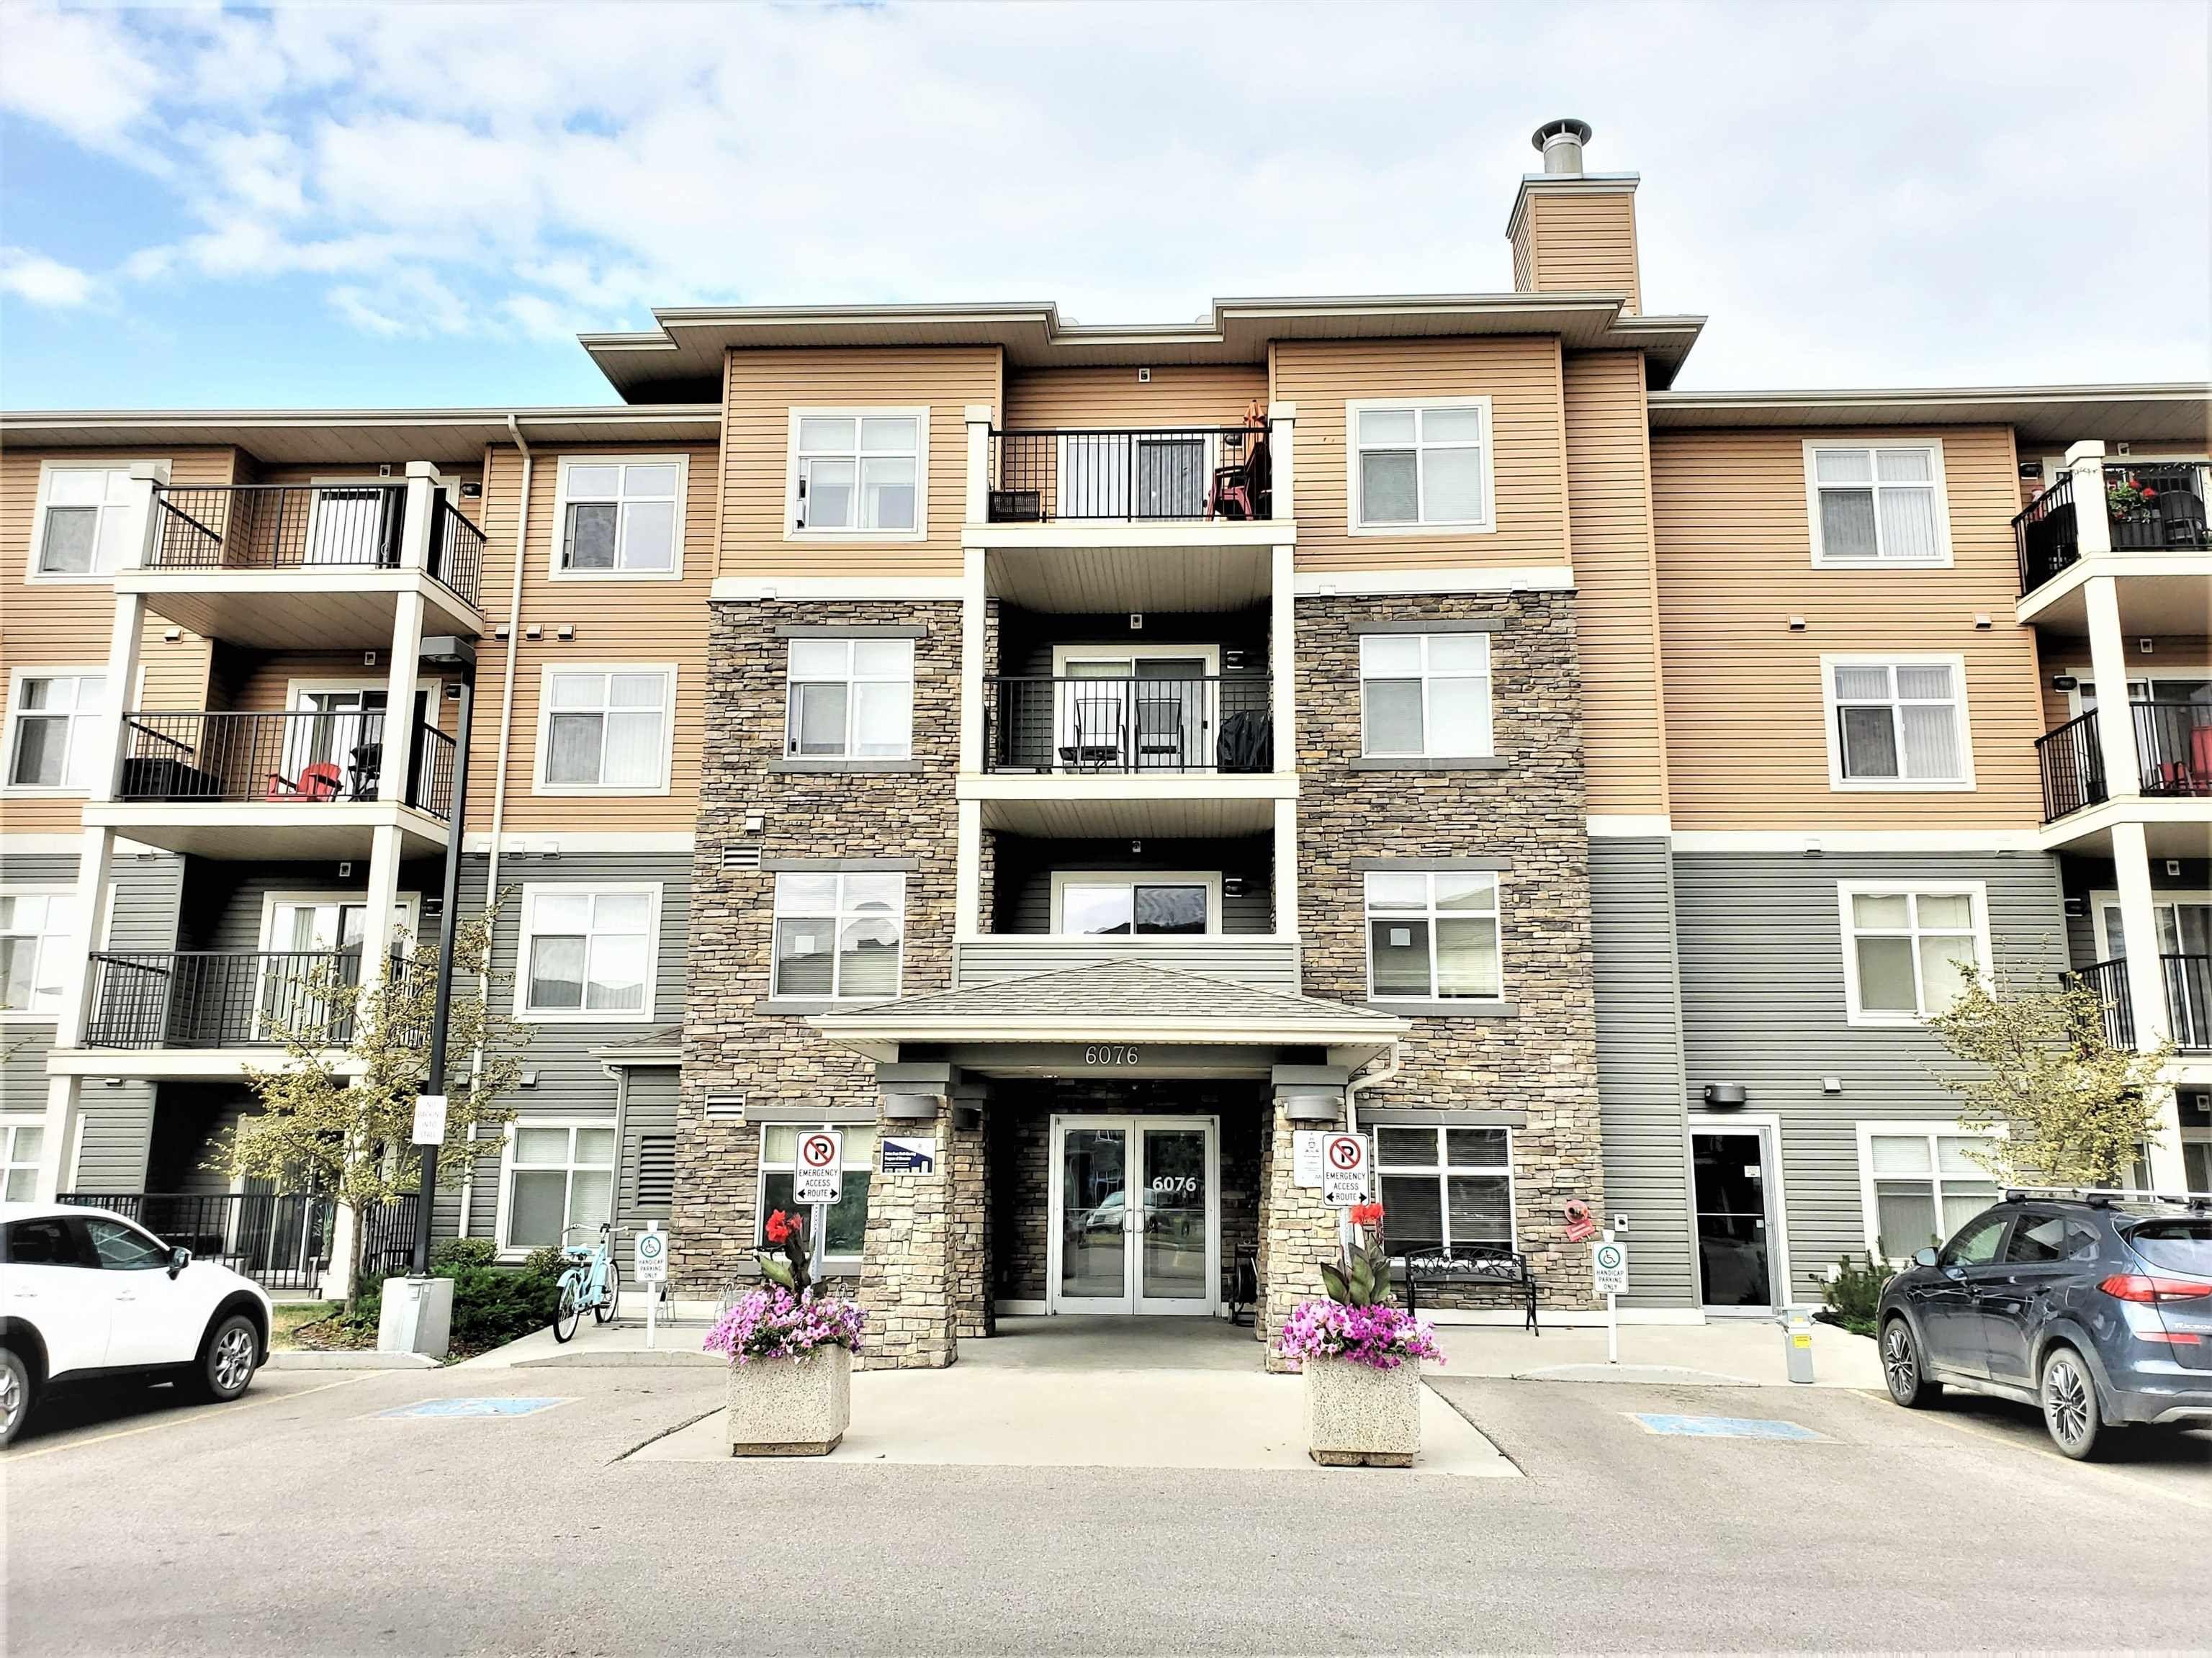 Main Photo: 438 6076 SCHONSEE Way in Edmonton: Zone 28 Condo for sale : MLS®# E4260047